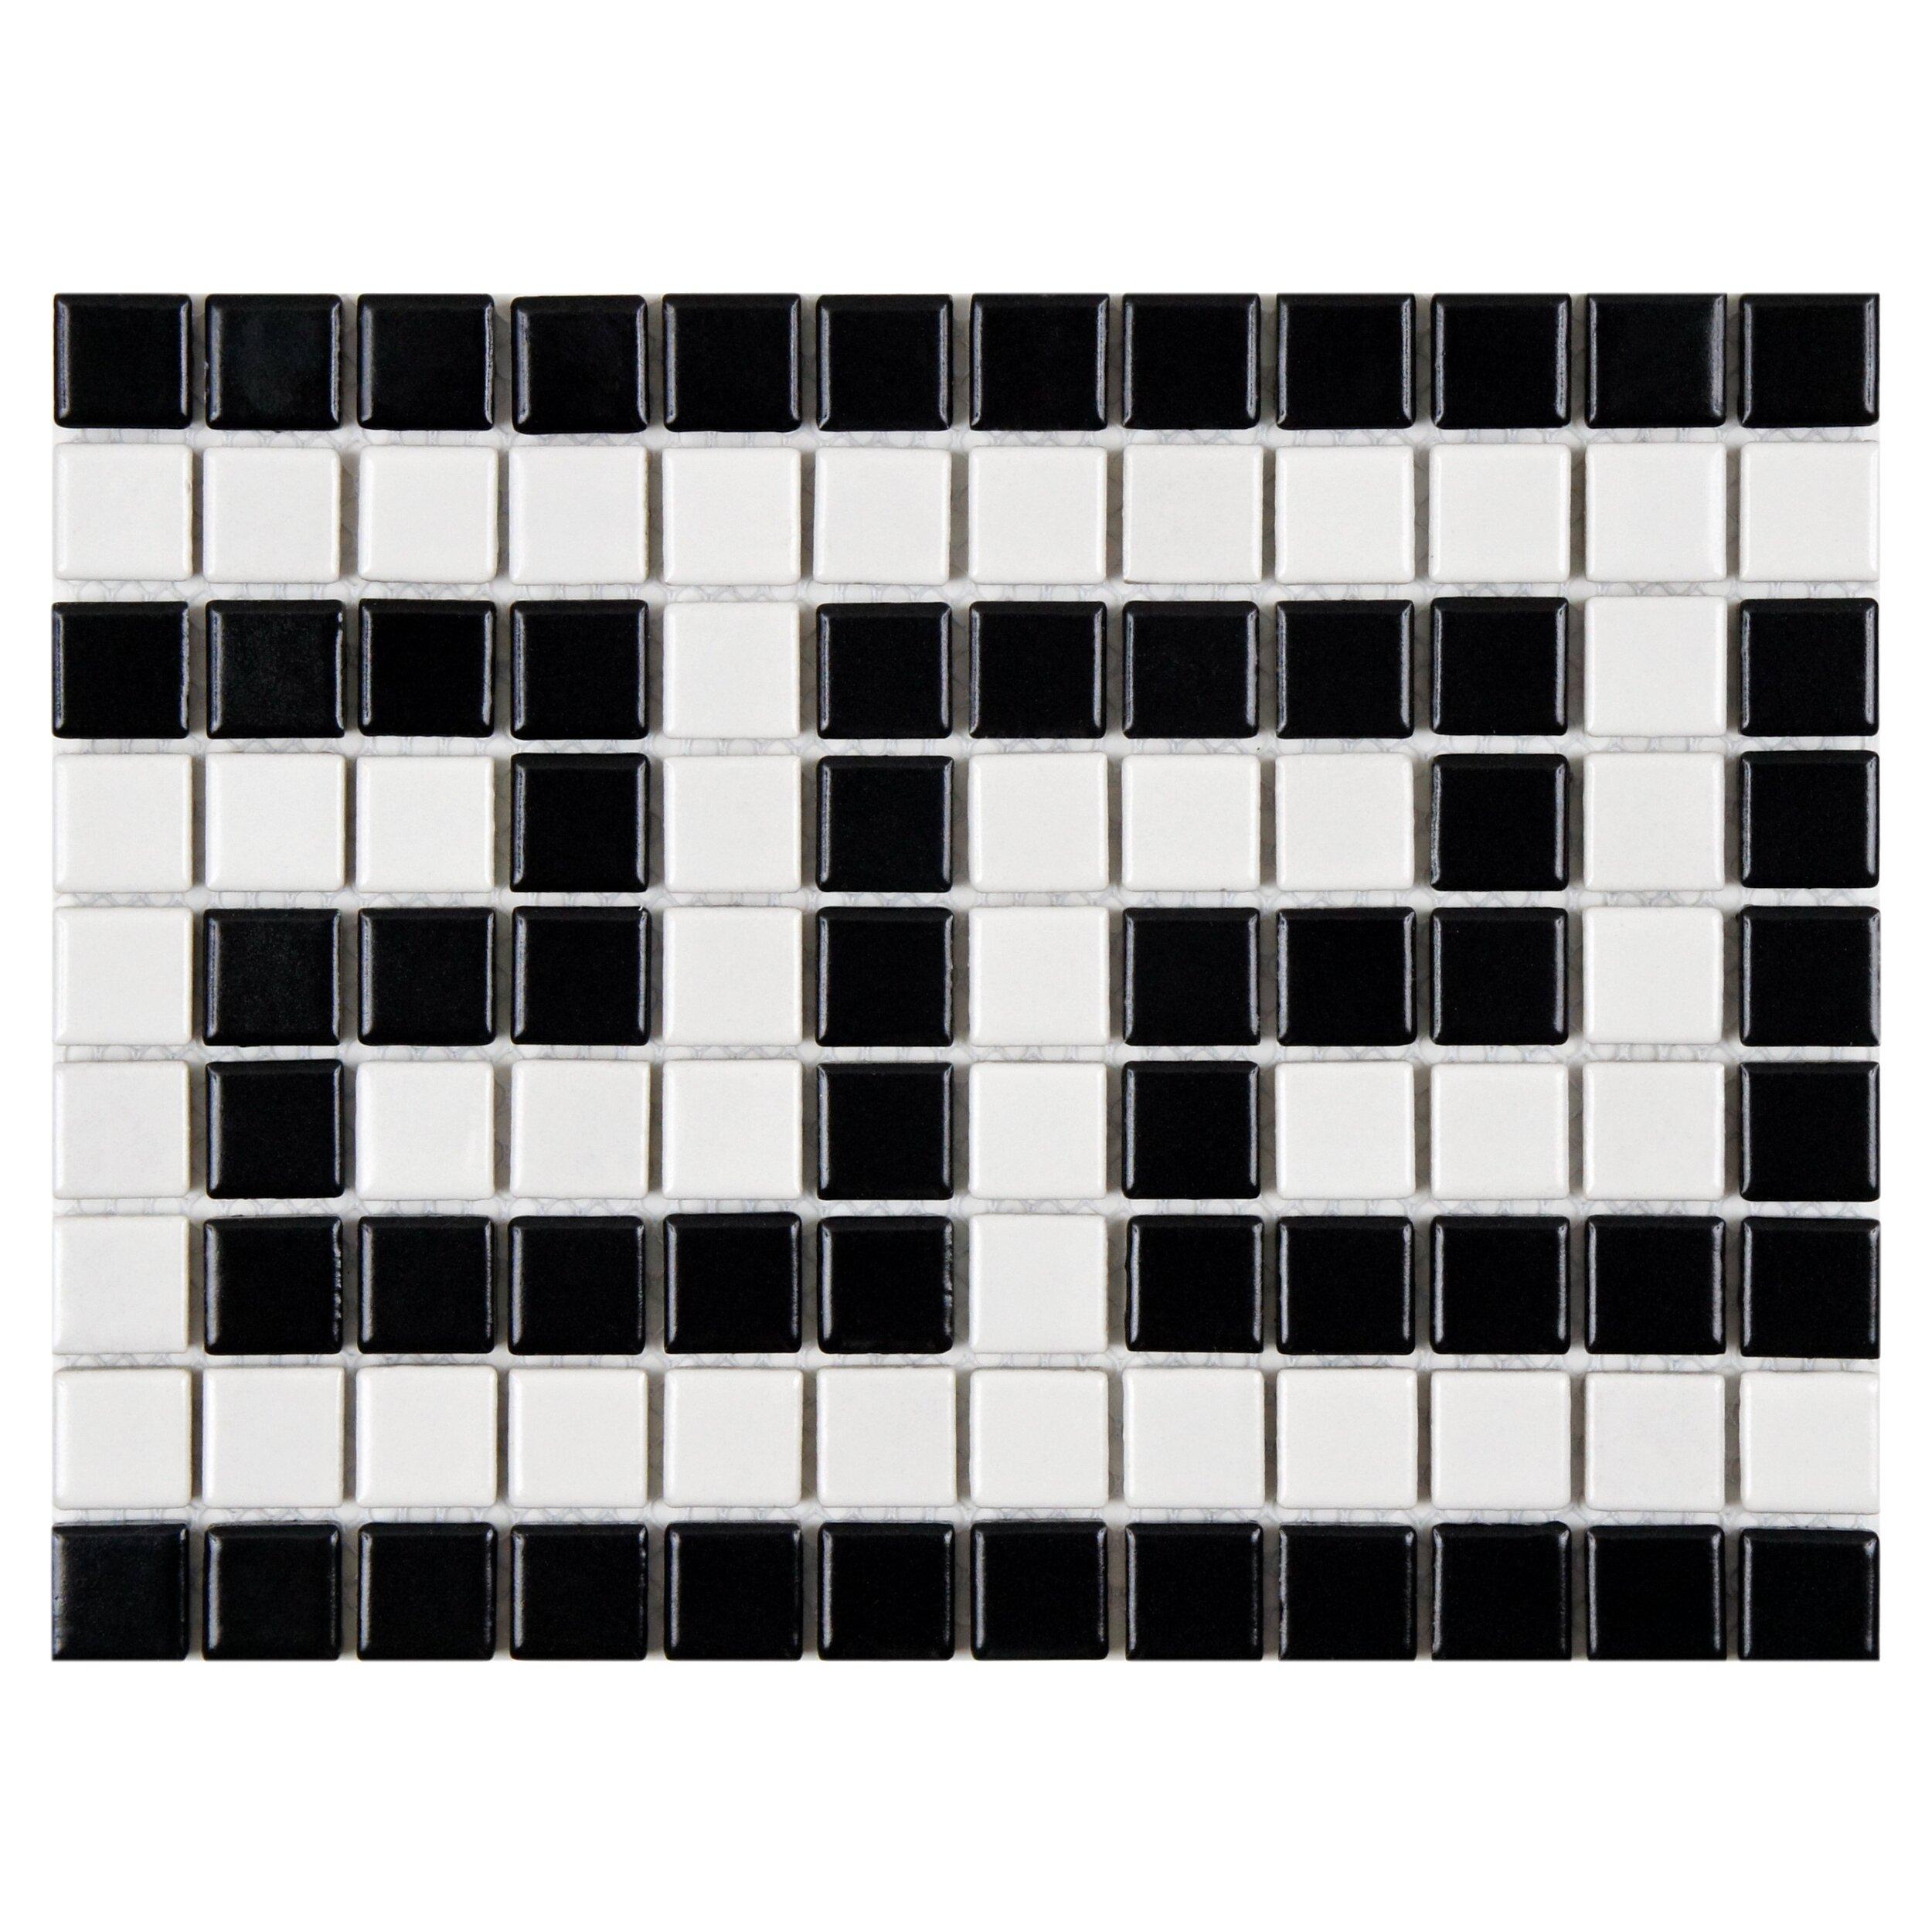 Versace Chair Retro Greek Key 0 81 Quot X 81 Quot Porcelain Mosaic Floor And